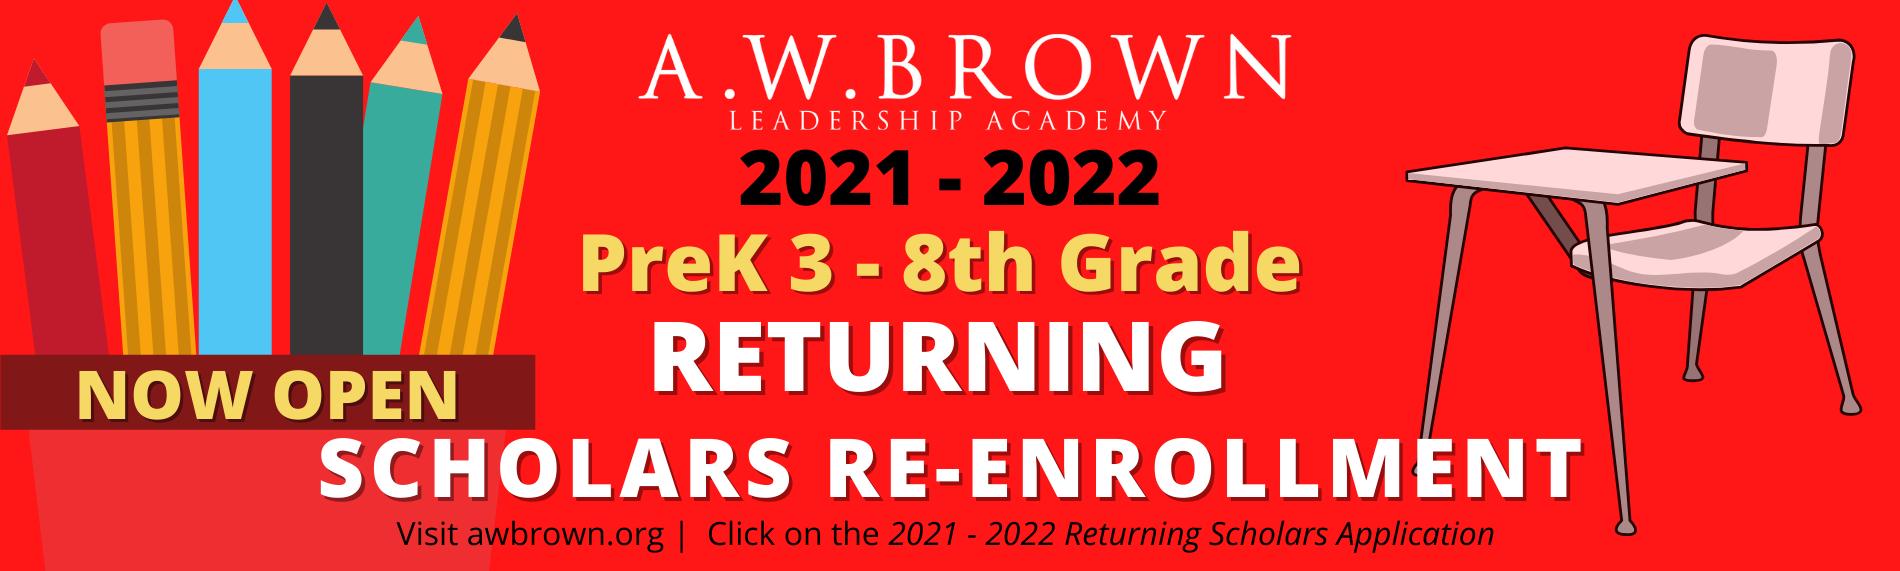 Returning Scholars Re- Enrollment